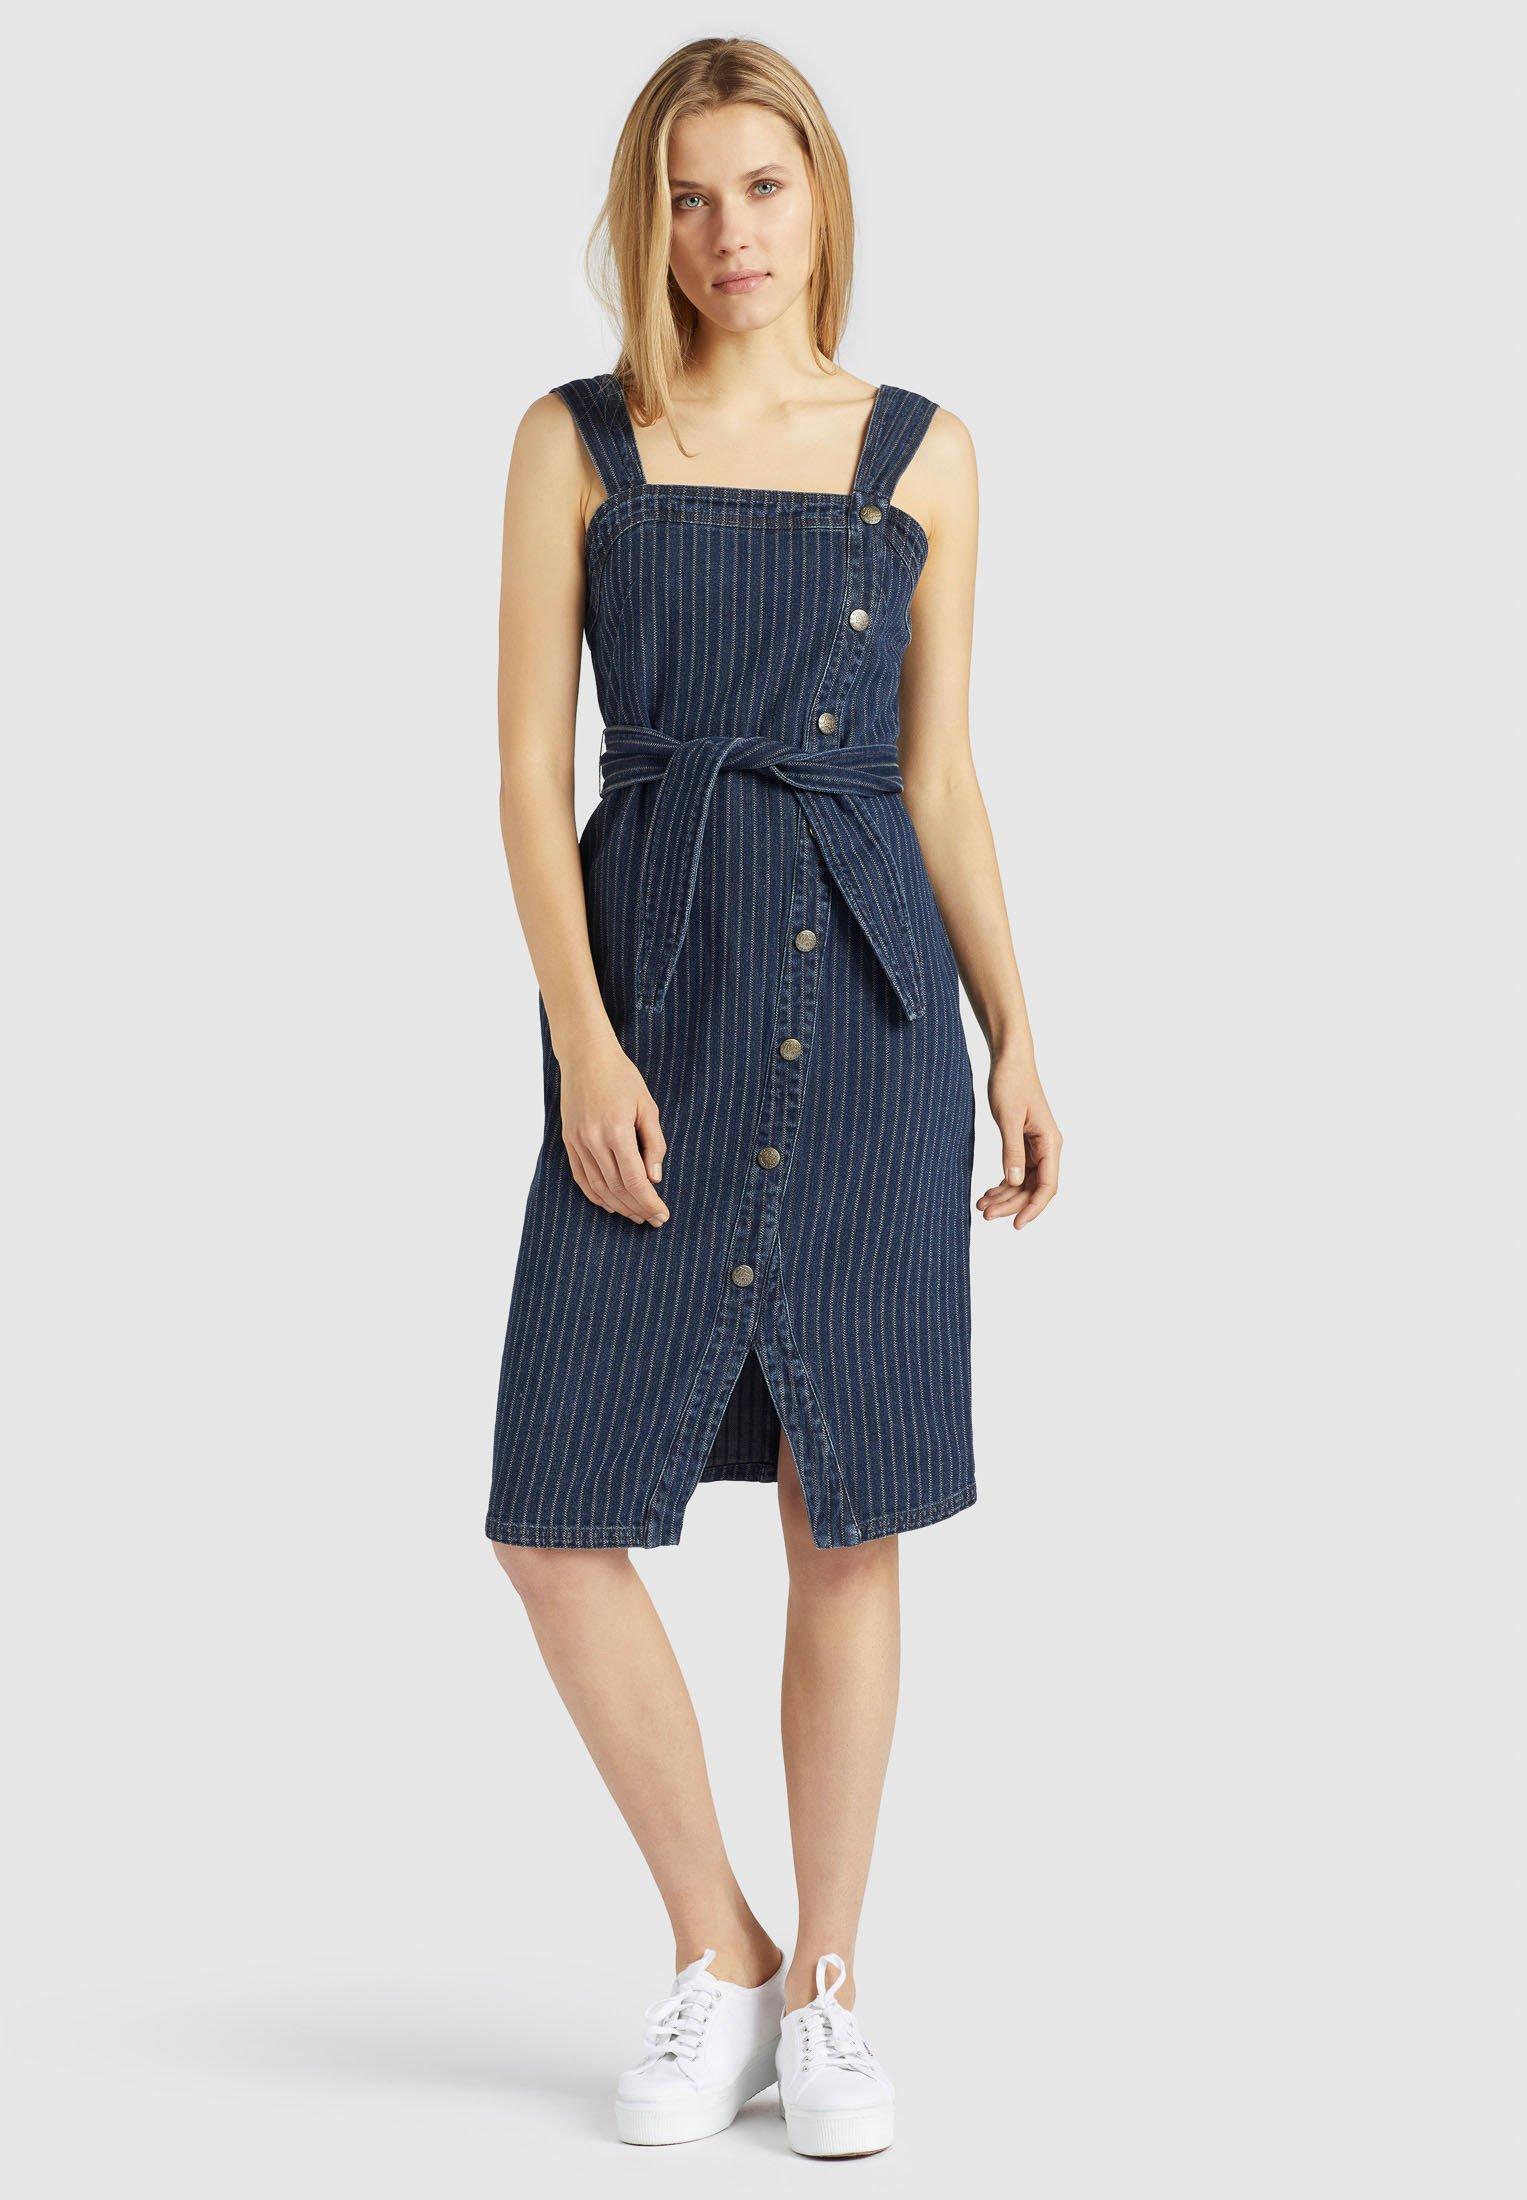 Khujo Avigail - Denim Dress Dark Blue